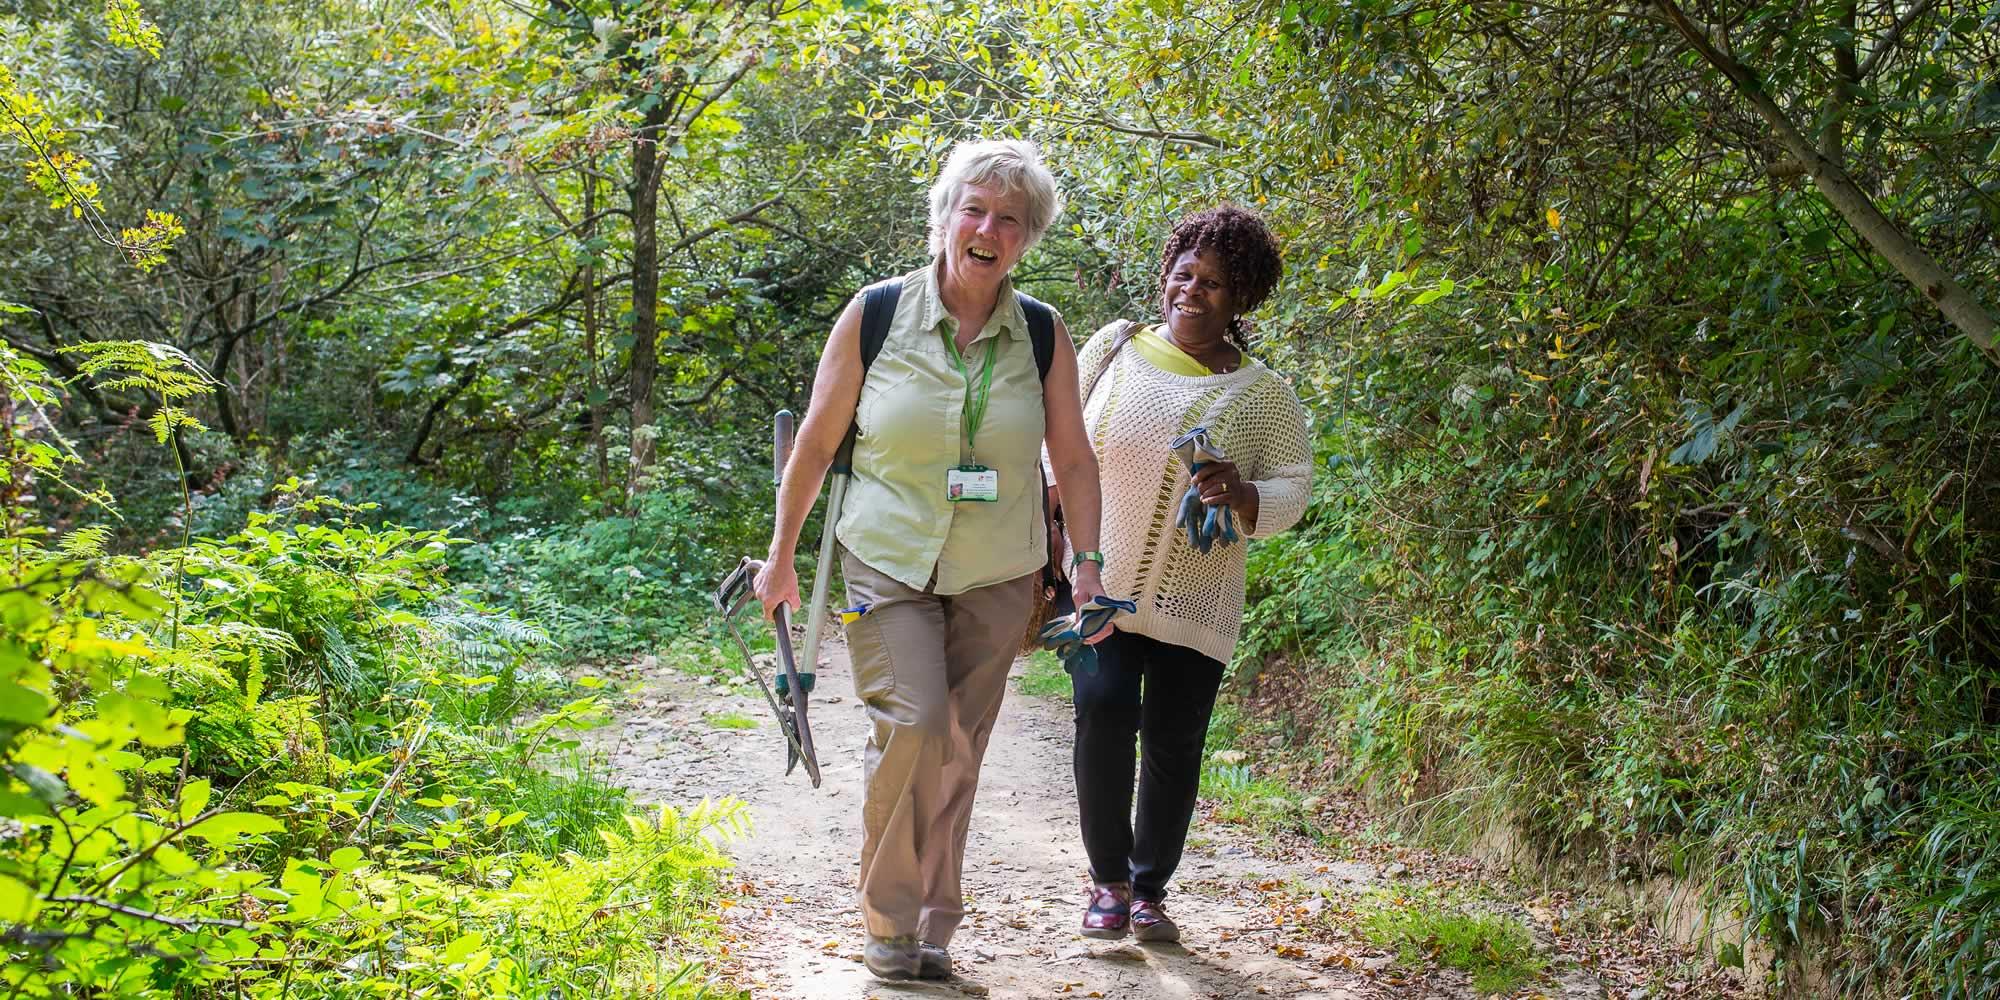 Two women walking through a summer woodland